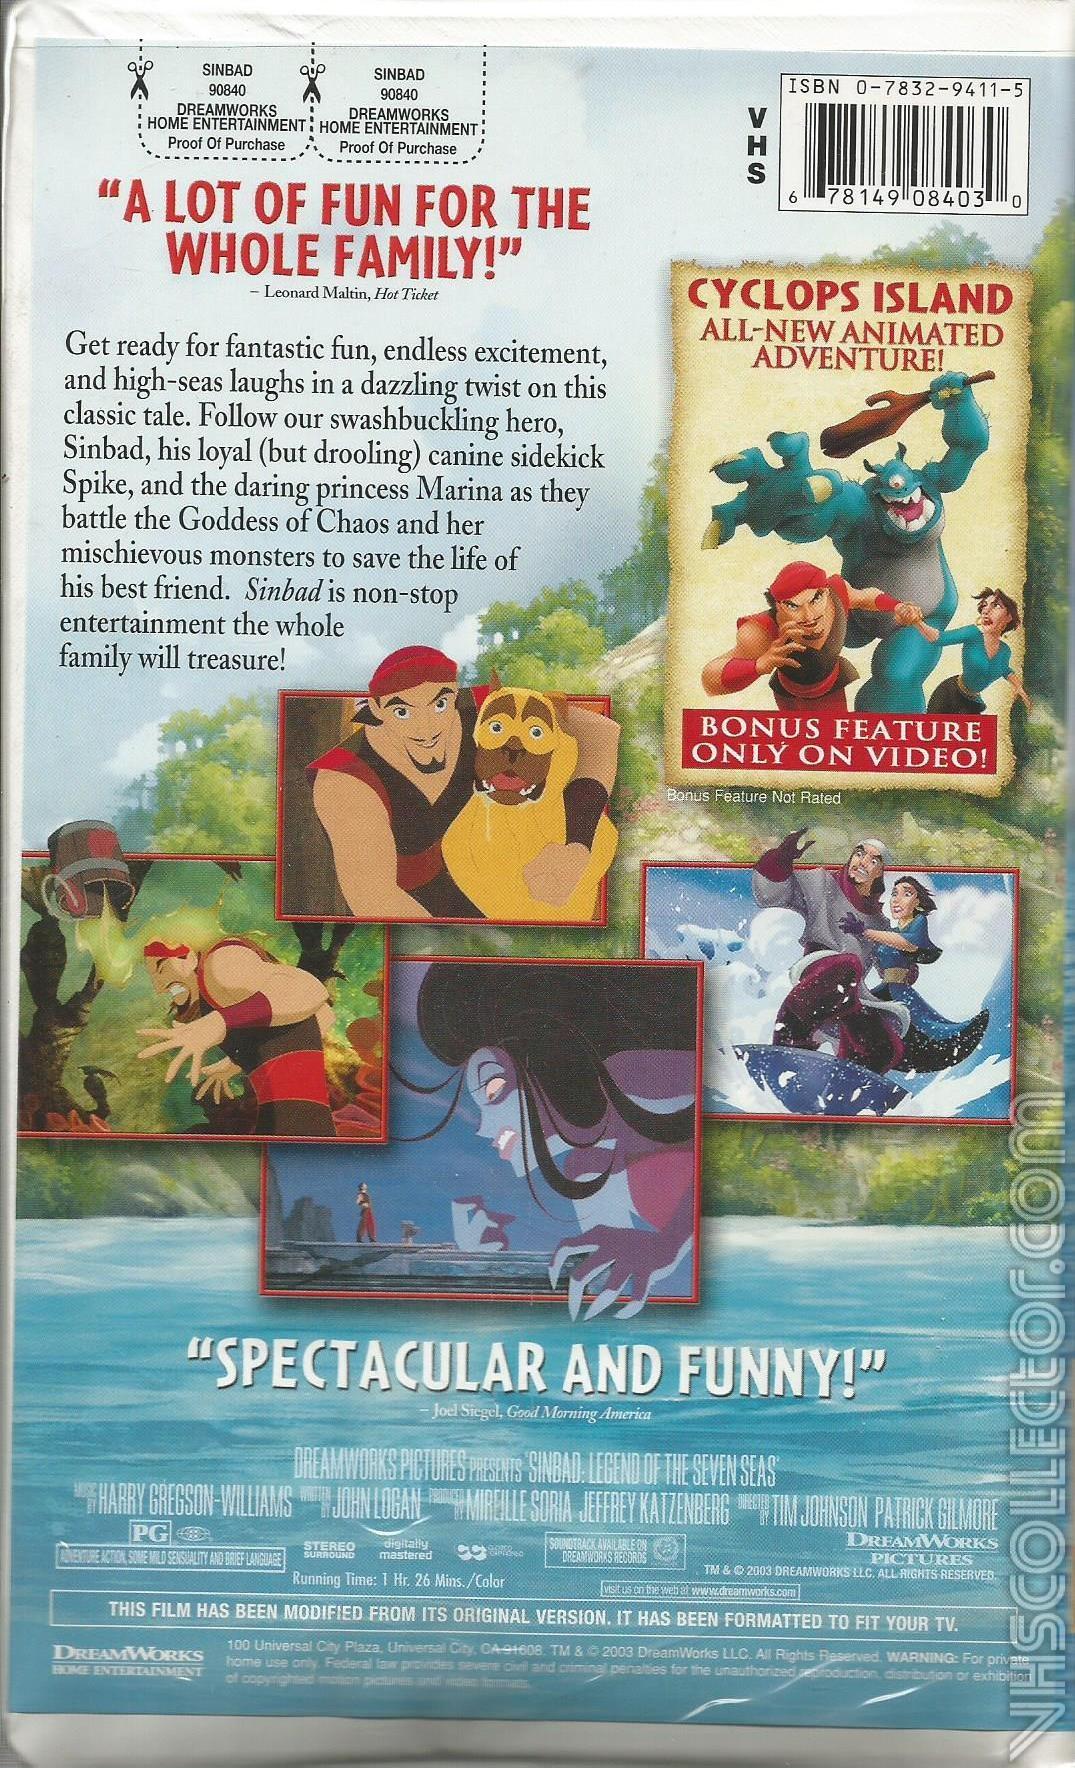 Sinbad: Legend of the Seven Seas | VHSCollector.com